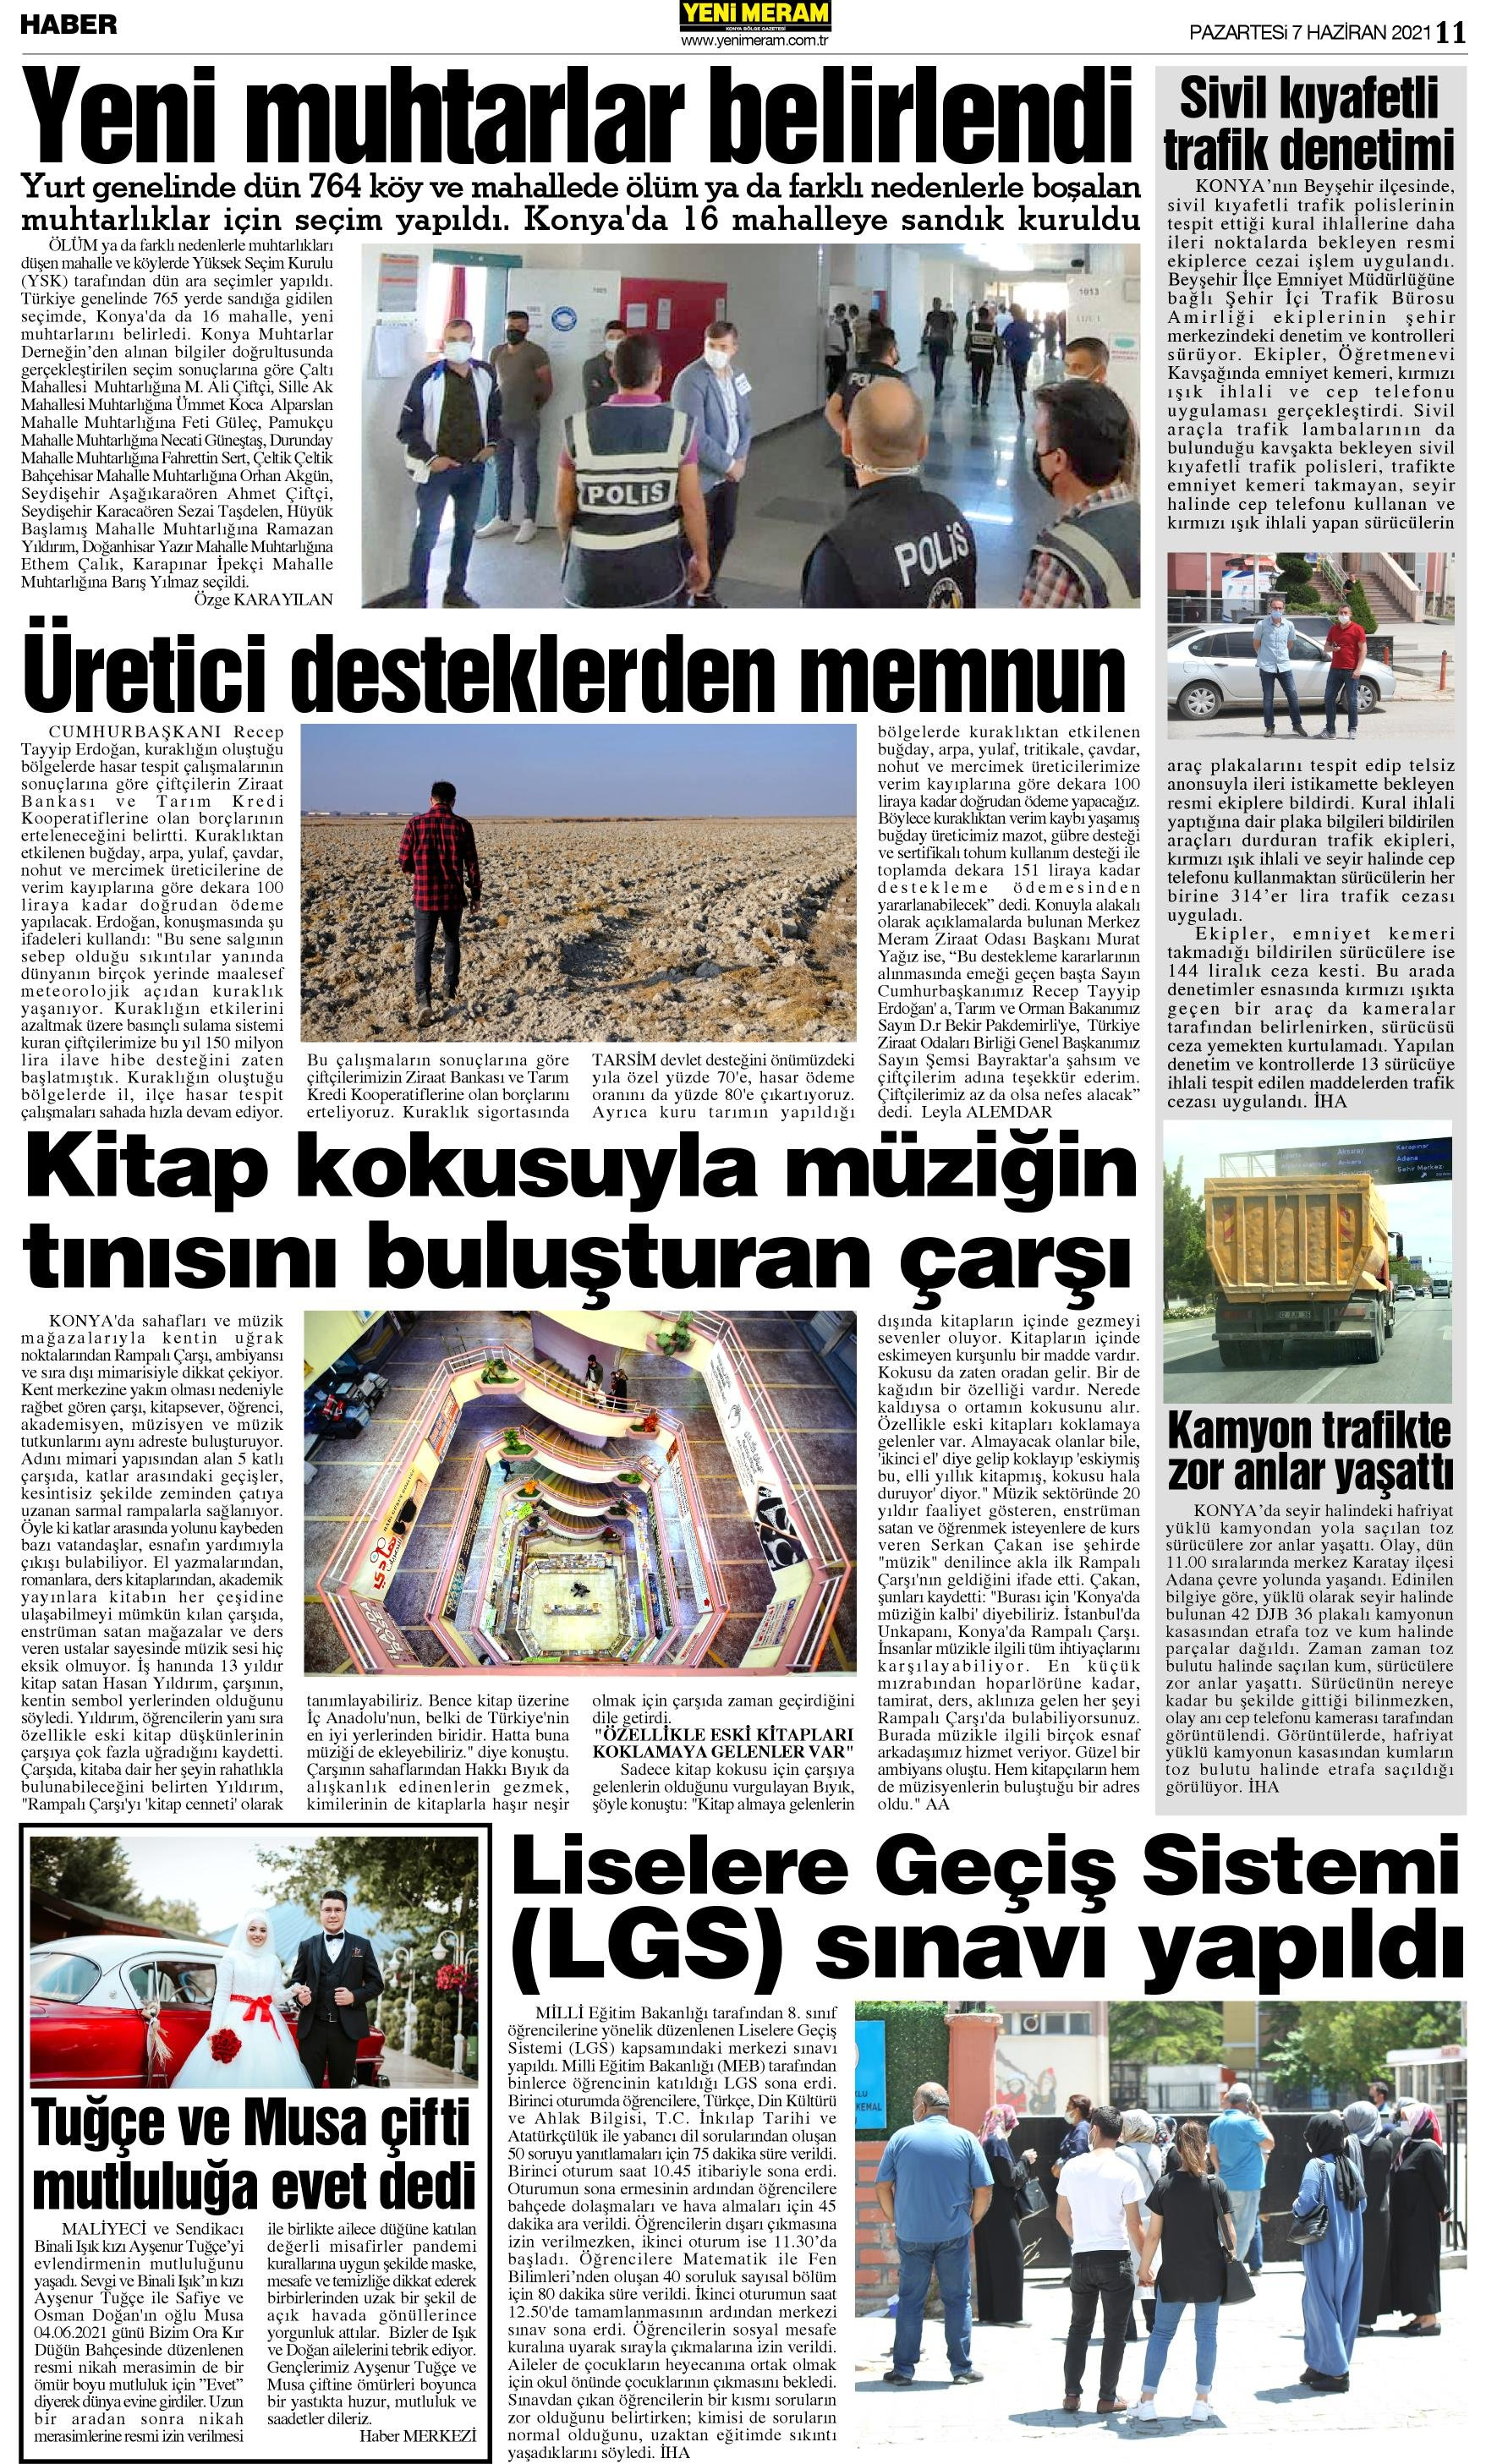 7 Haziran 2021 Yeni Meram Gazetesi